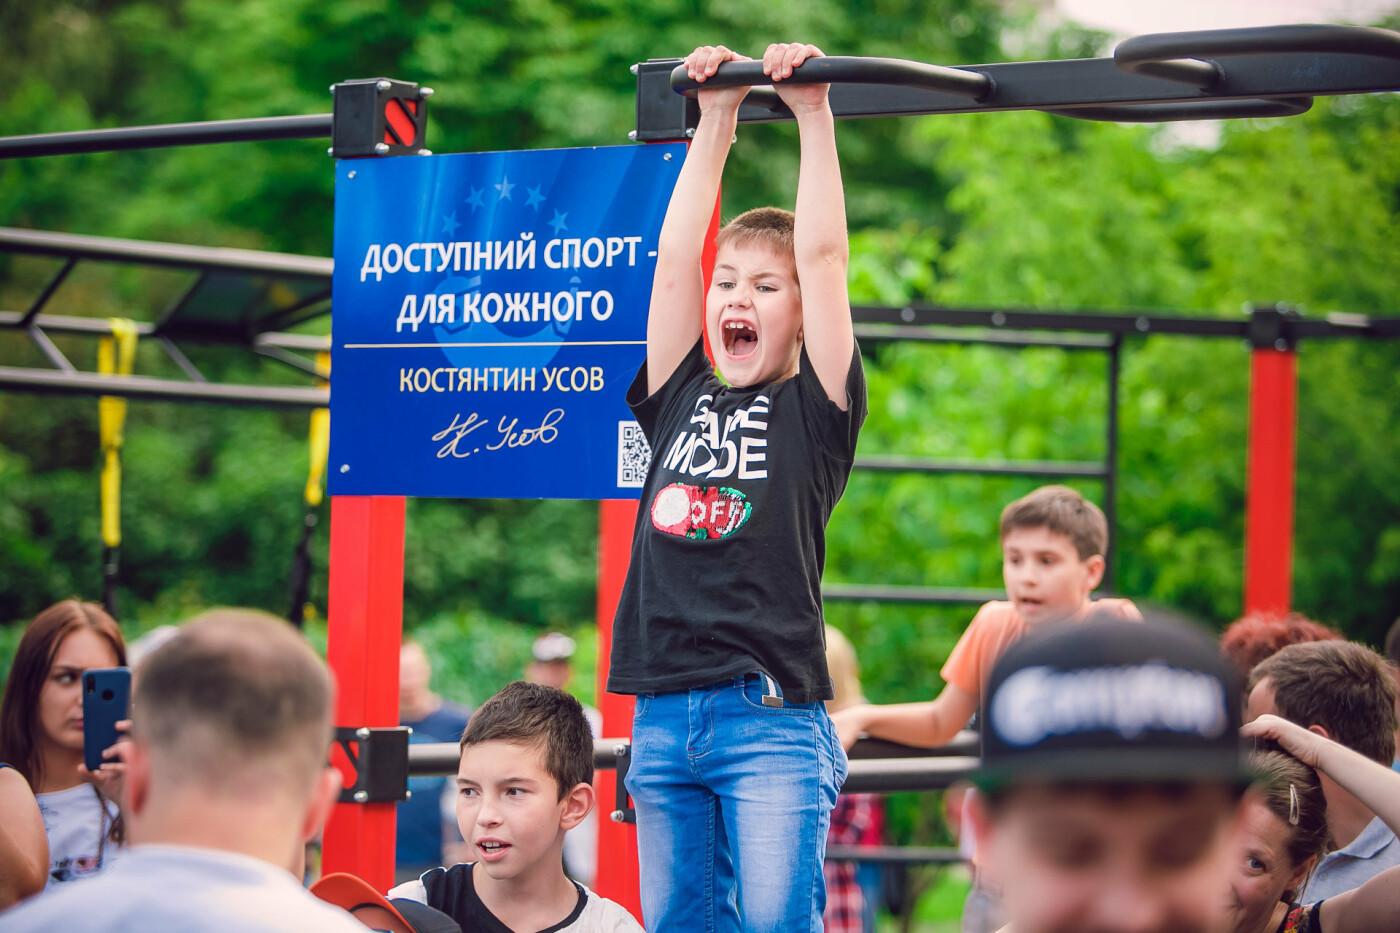 «Спасибо», – ОСМД «Муравейник» в Кривом Роге поблагодарило депутата Усова за спортивную площадку в их дворе, фото-1